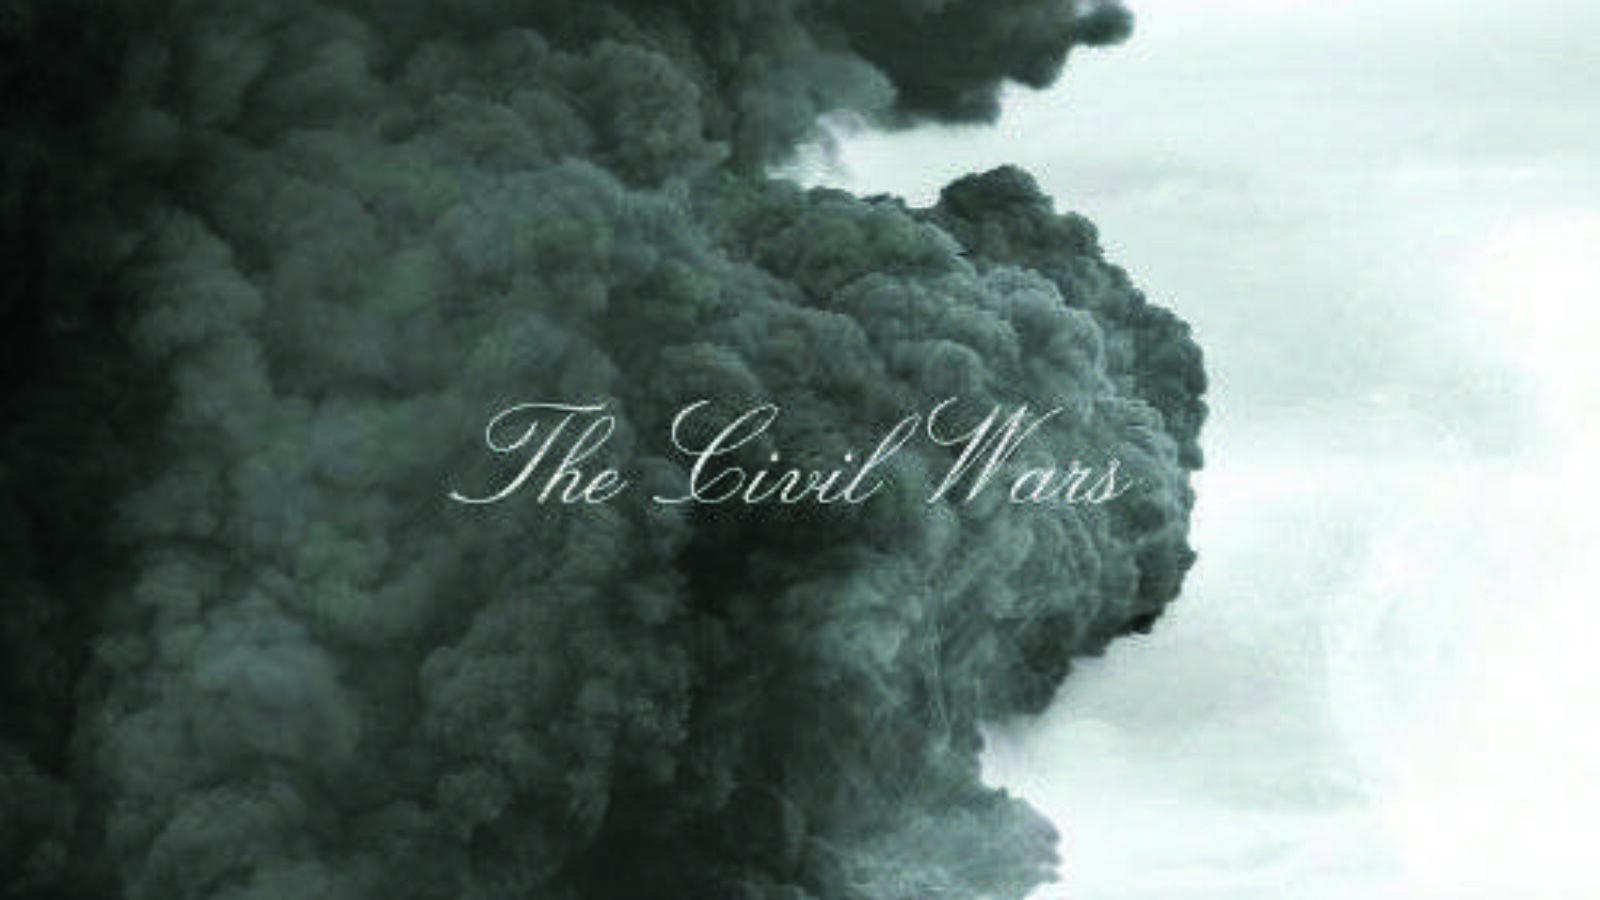 THE CIVIL WARS The Civil Wars